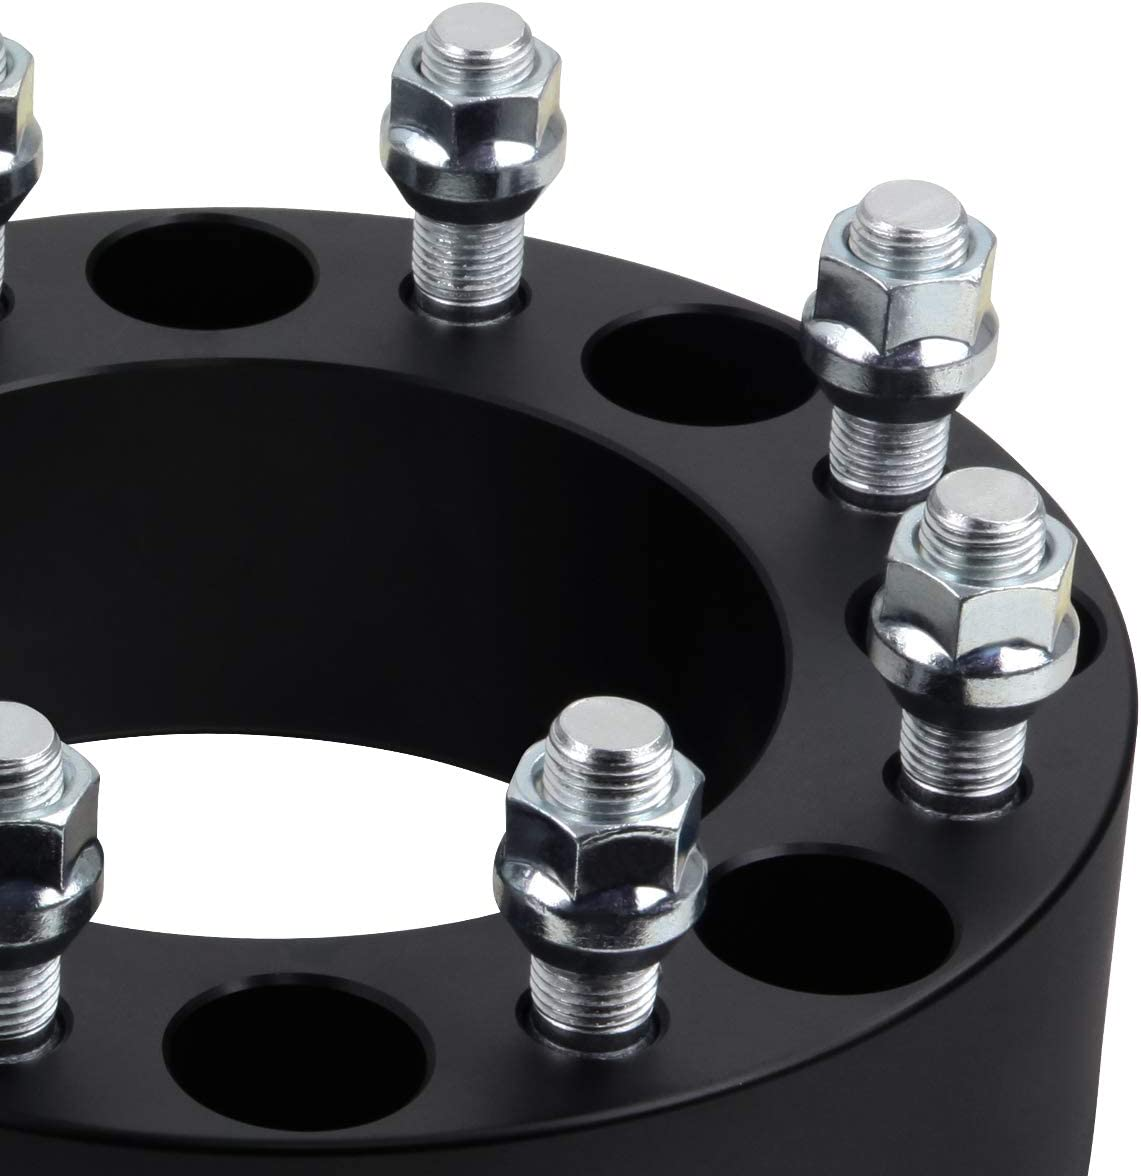 Black 2x 2 Wheel Spacers for 2000-2010 Chevy Silverado 2500HD Wheel Adapters 8x165.1 to 8x170 mm with M14x1.5 Studs 2005+ F250 Super Duty Wheels on Silverado 2500HD Supreme Suspensions